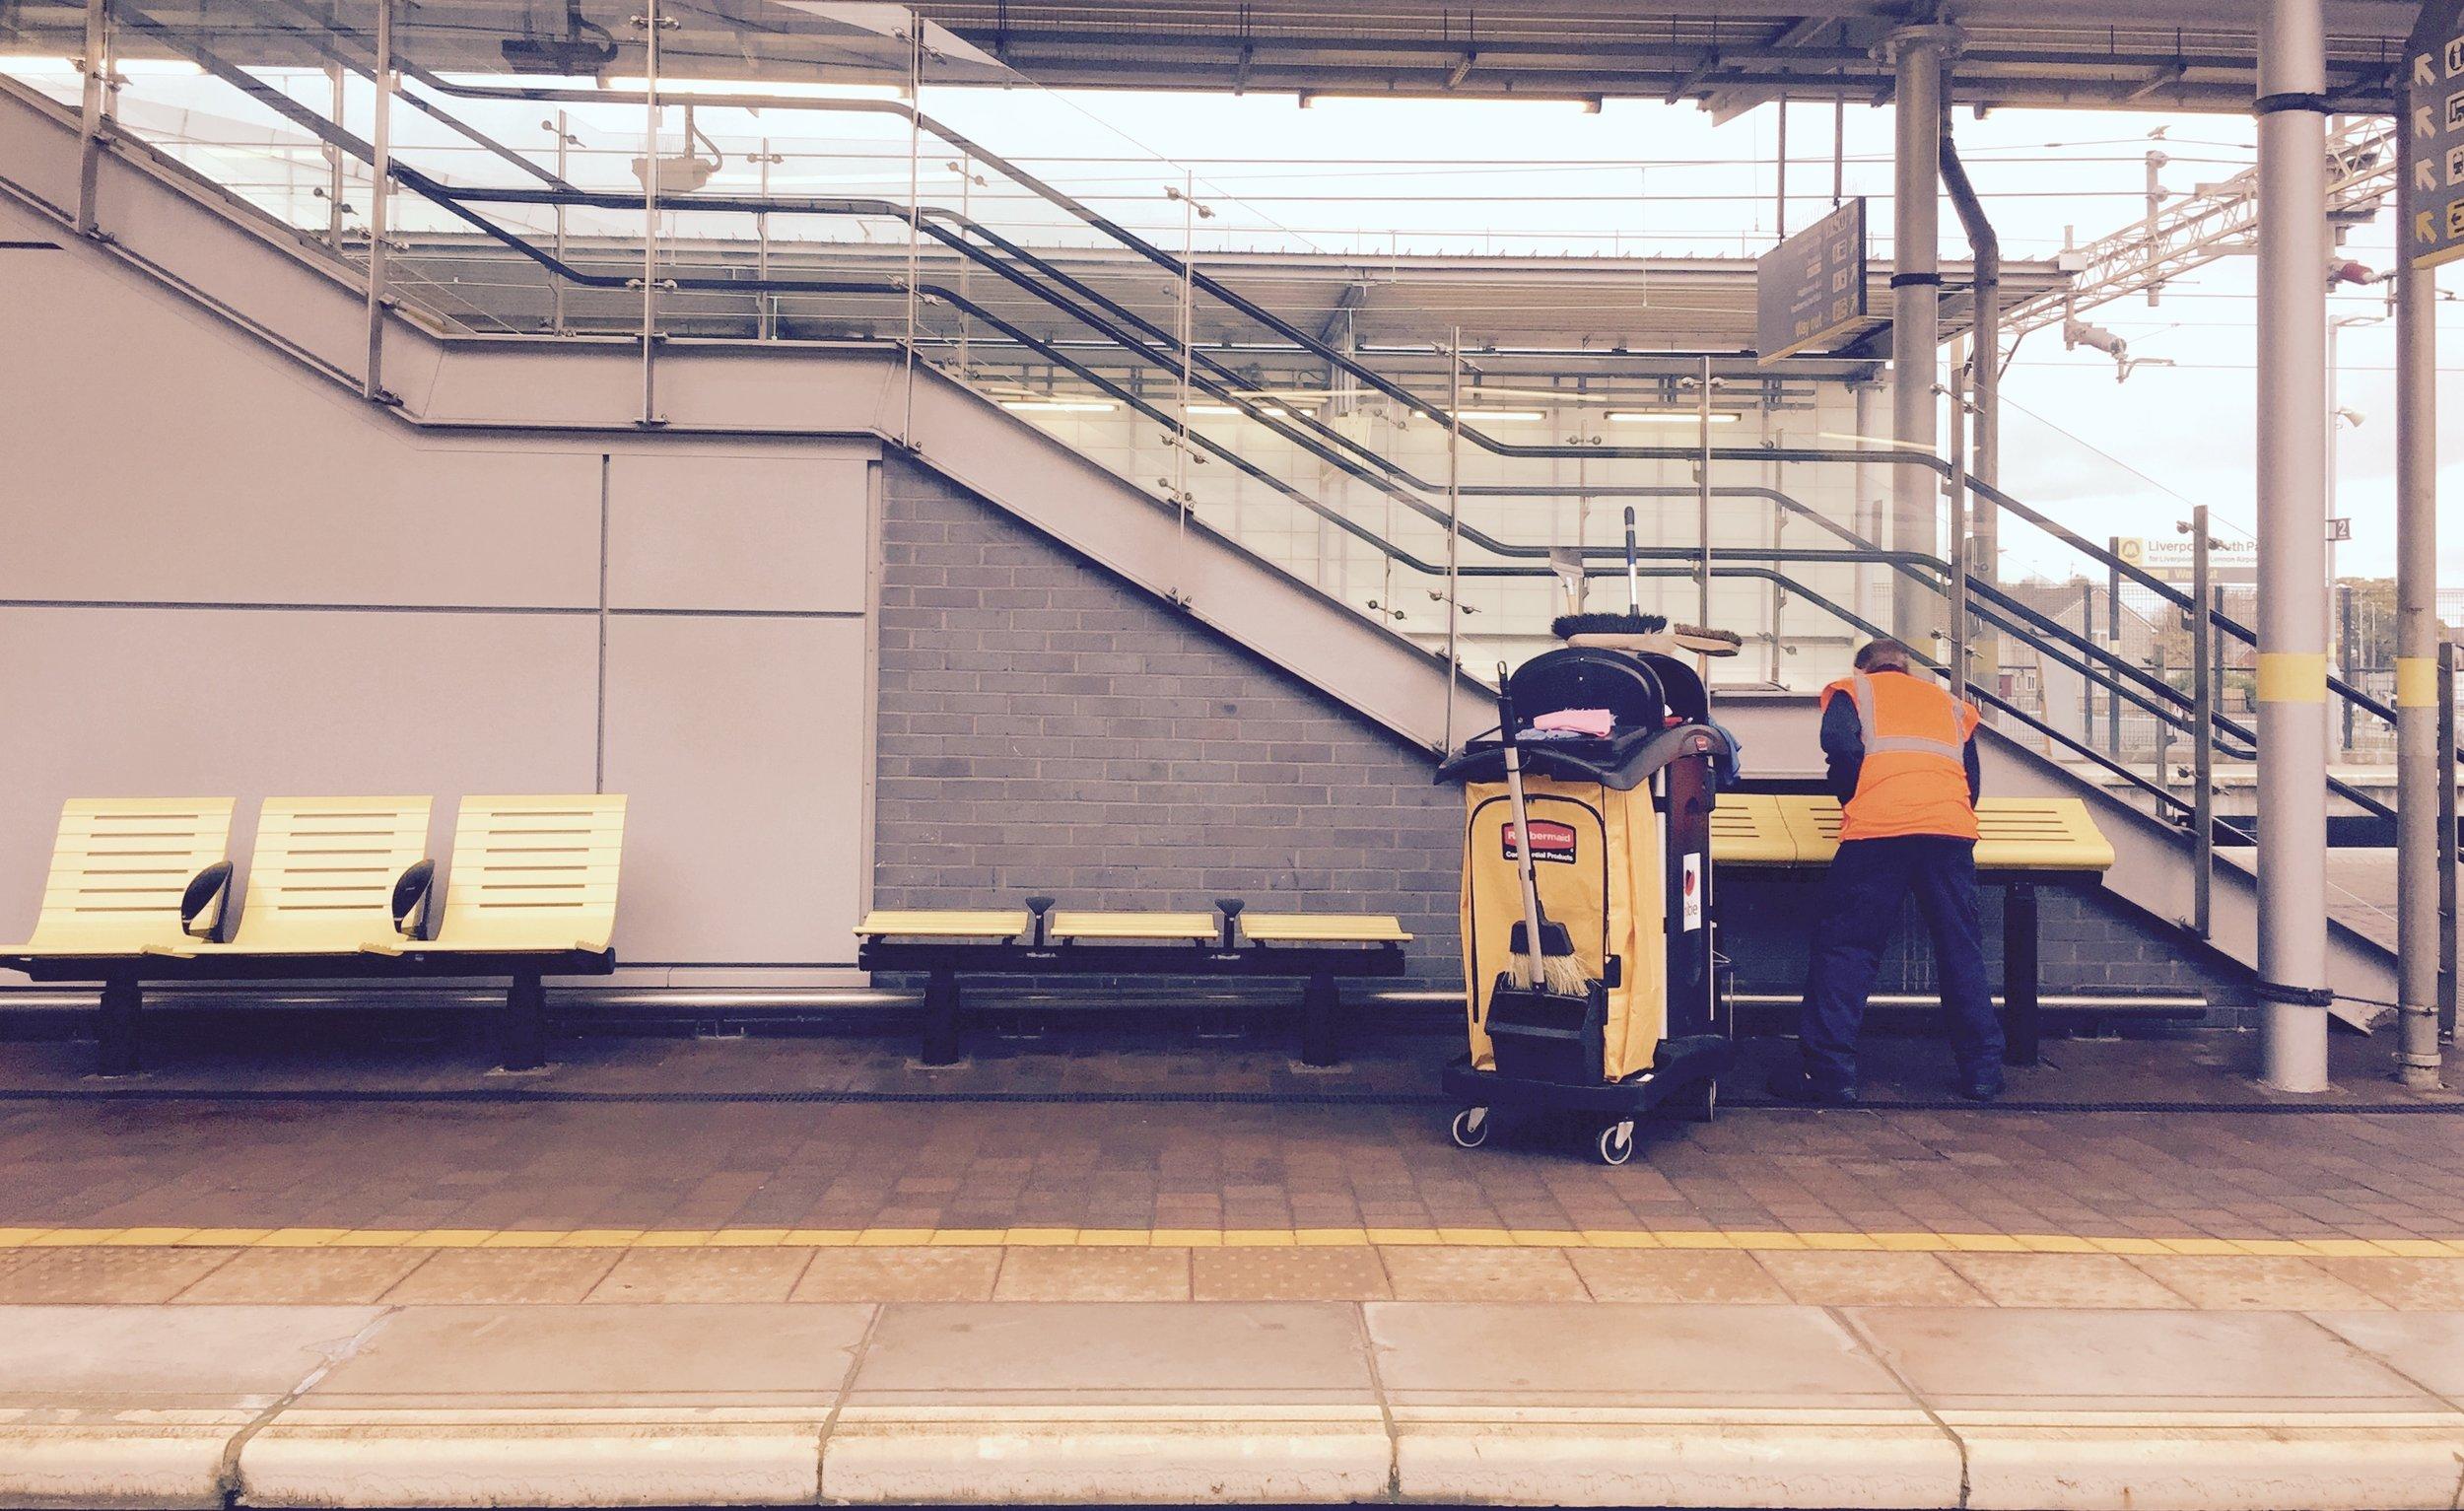 Platforms.